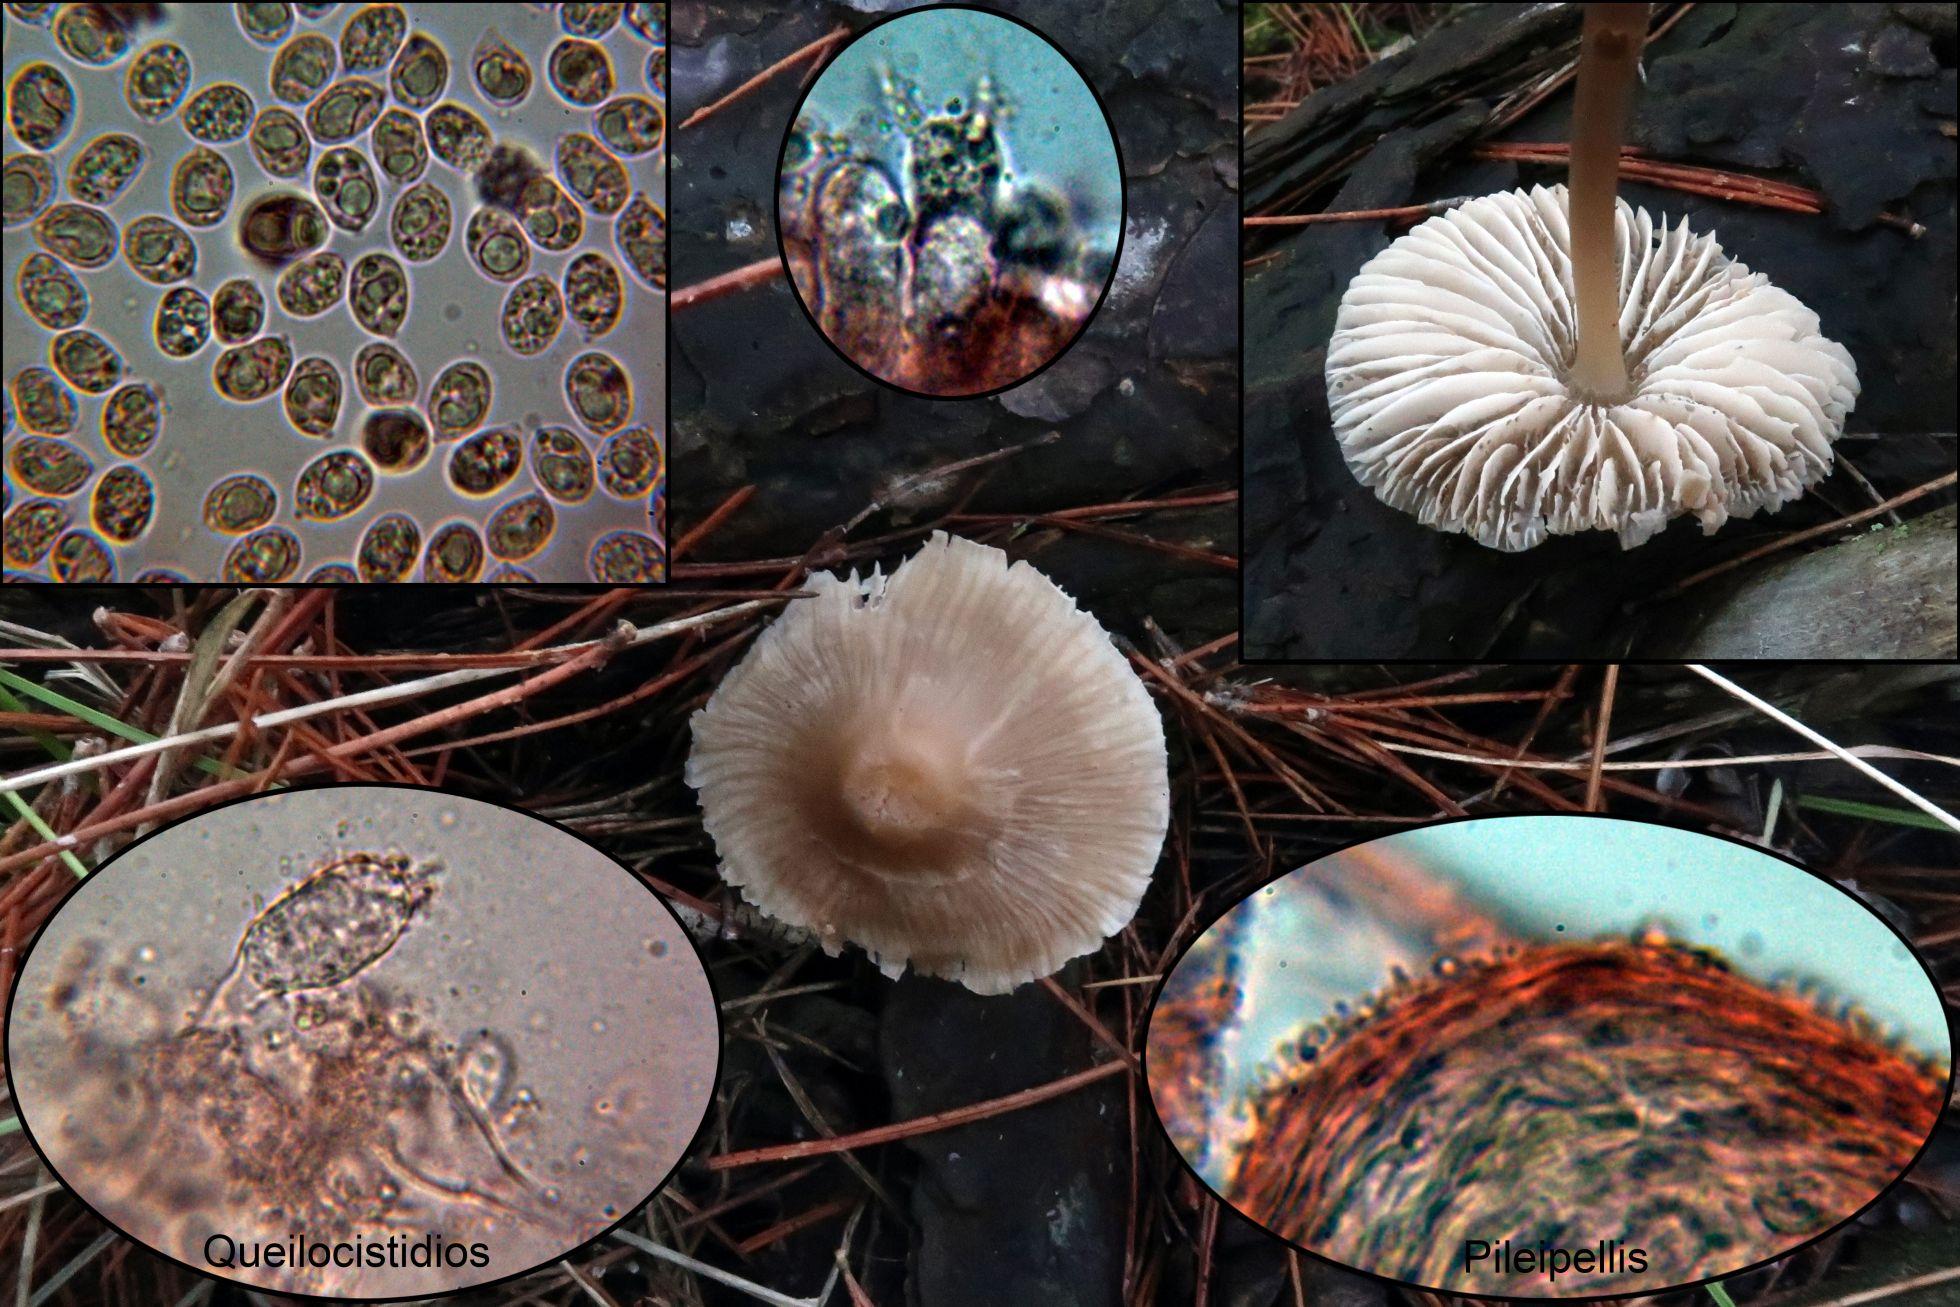 Mycenagalericulatap_2020-12-20.jpg